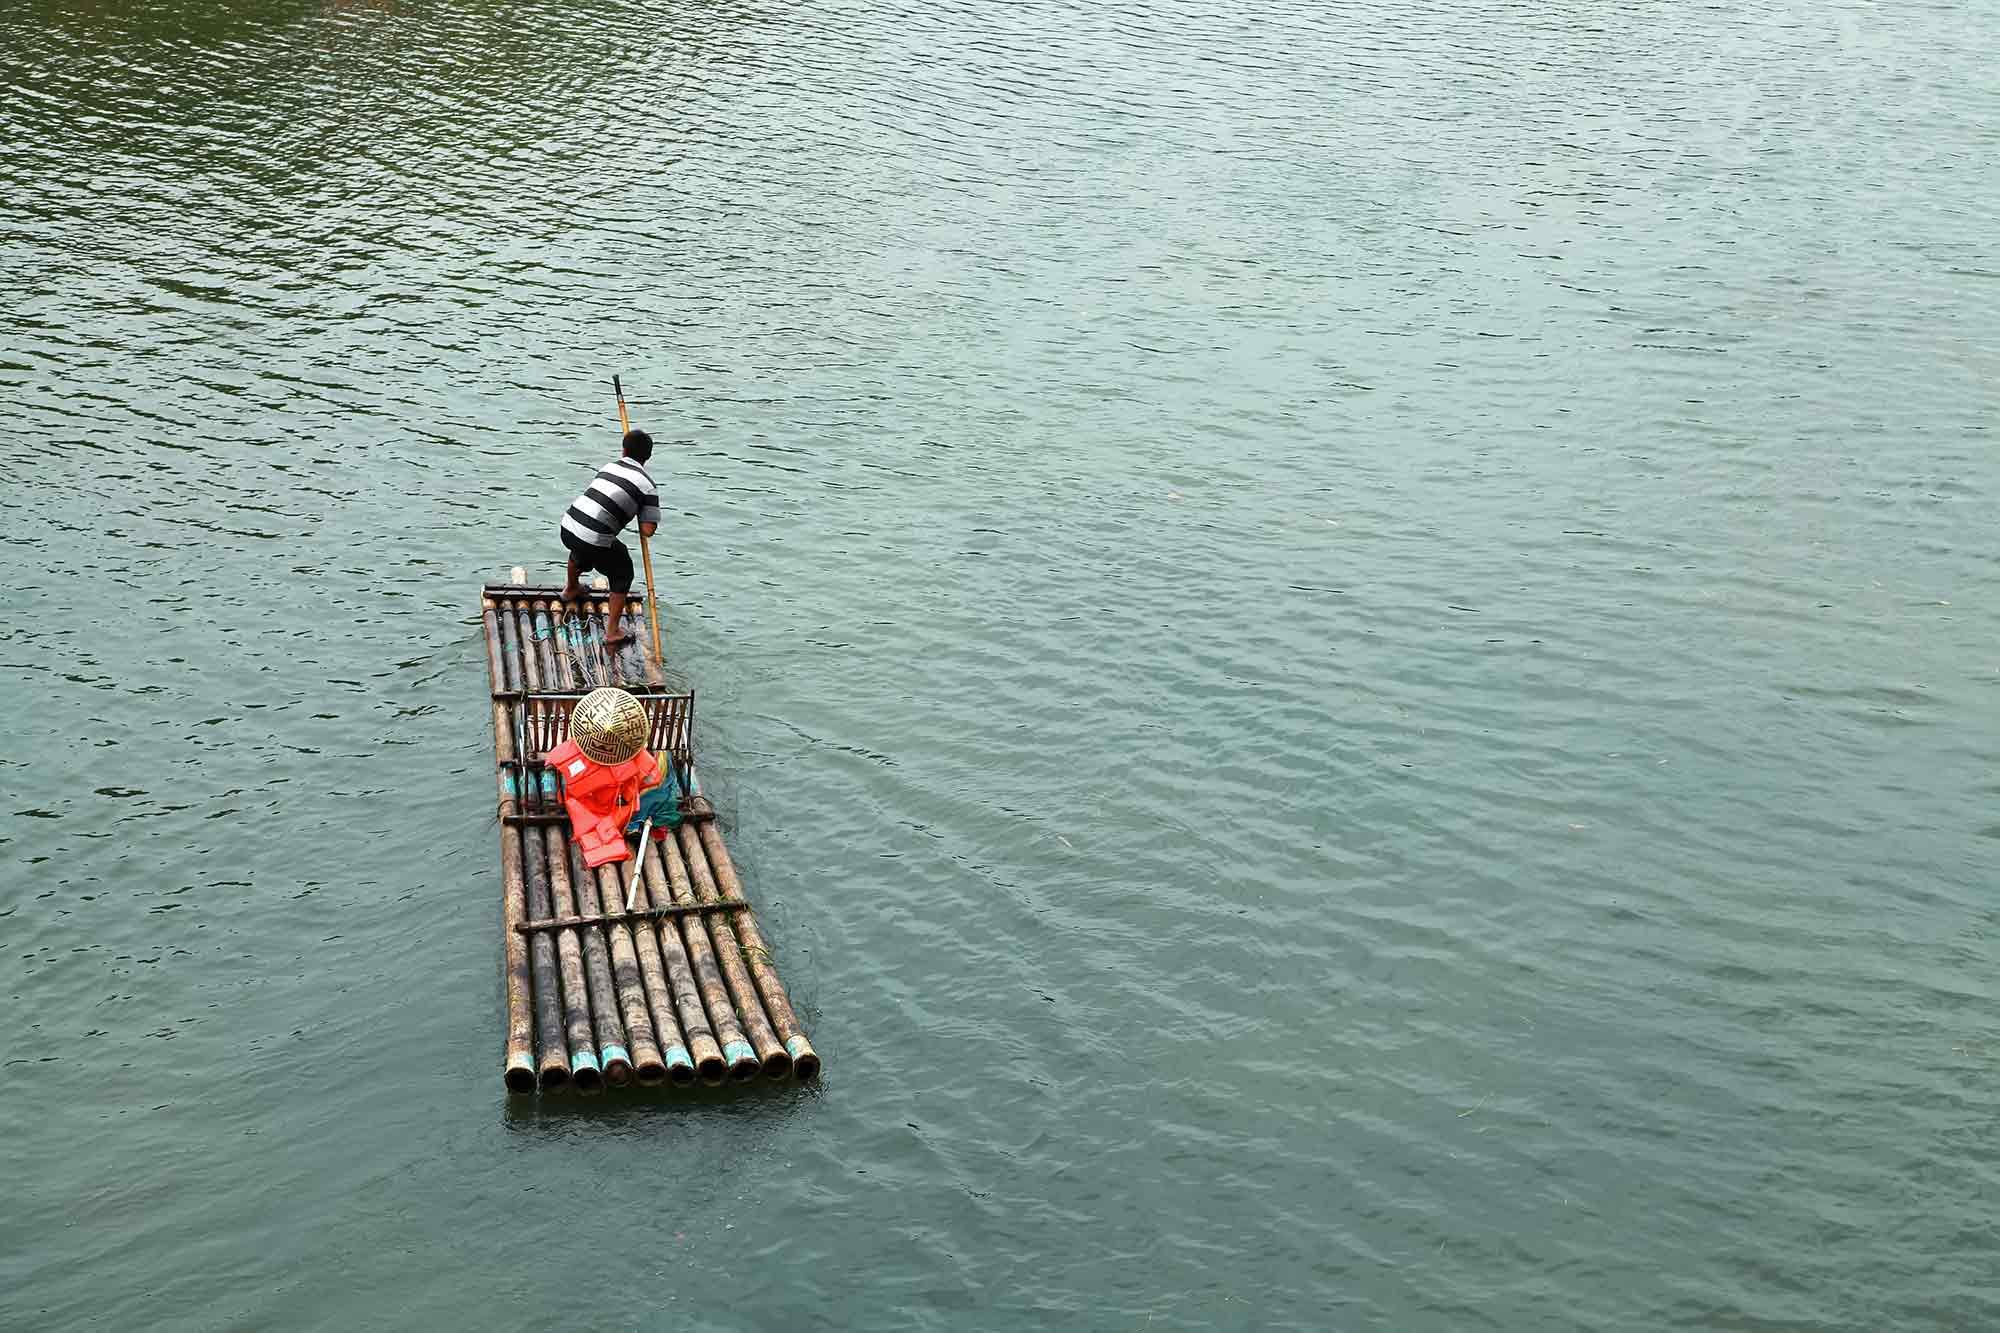 A bamboo raft along the Li River in Yangshuo, China. © Ulli Maier & Nisa Maier